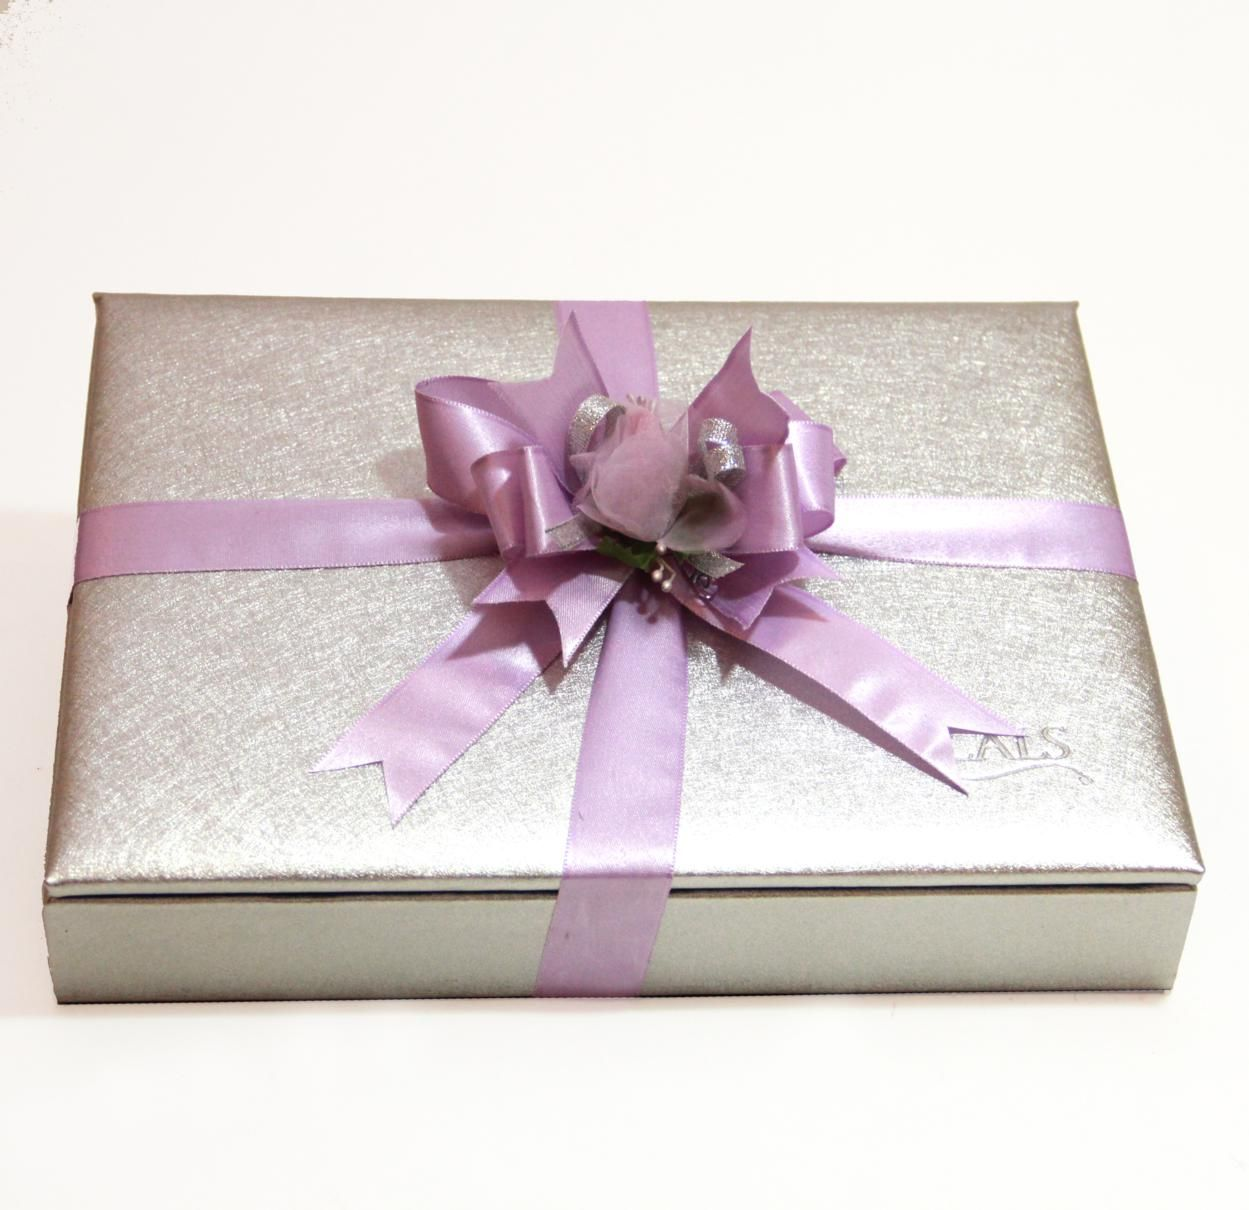 Lals Silver Box